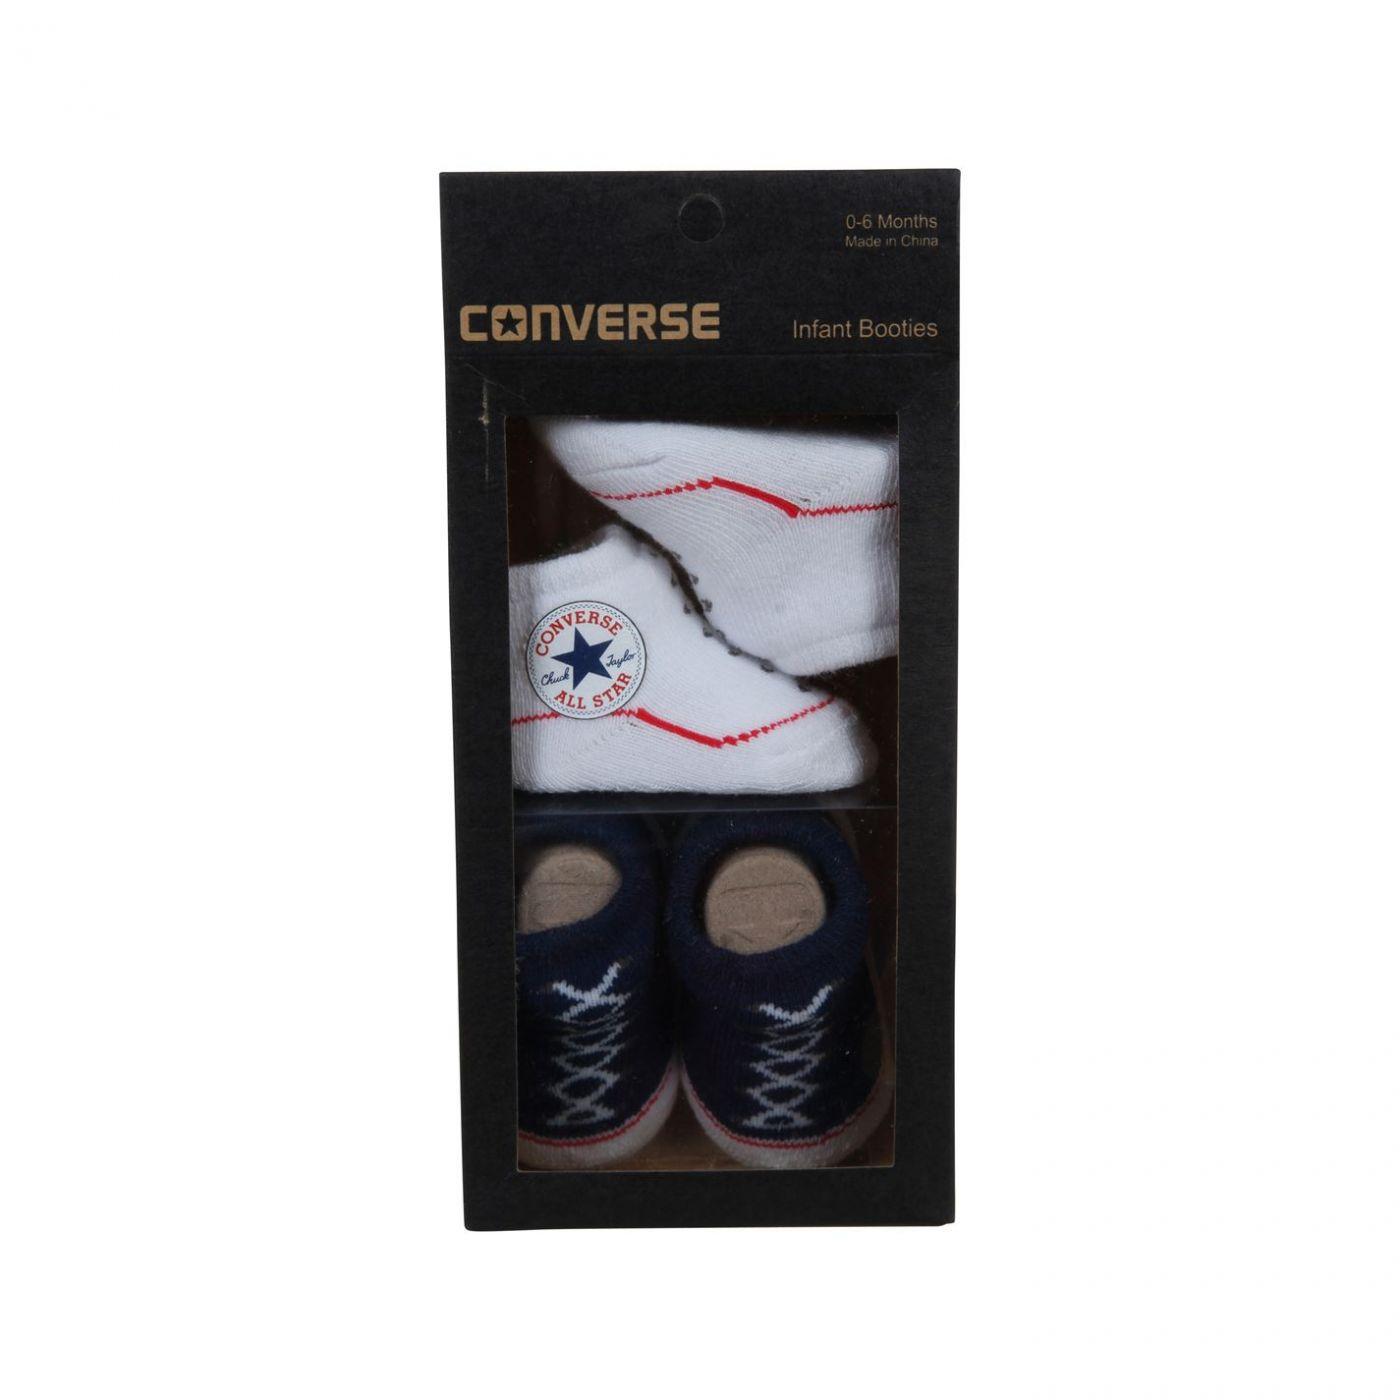 Converse Chuck Taylor All Star Crib Bootie Gift Box